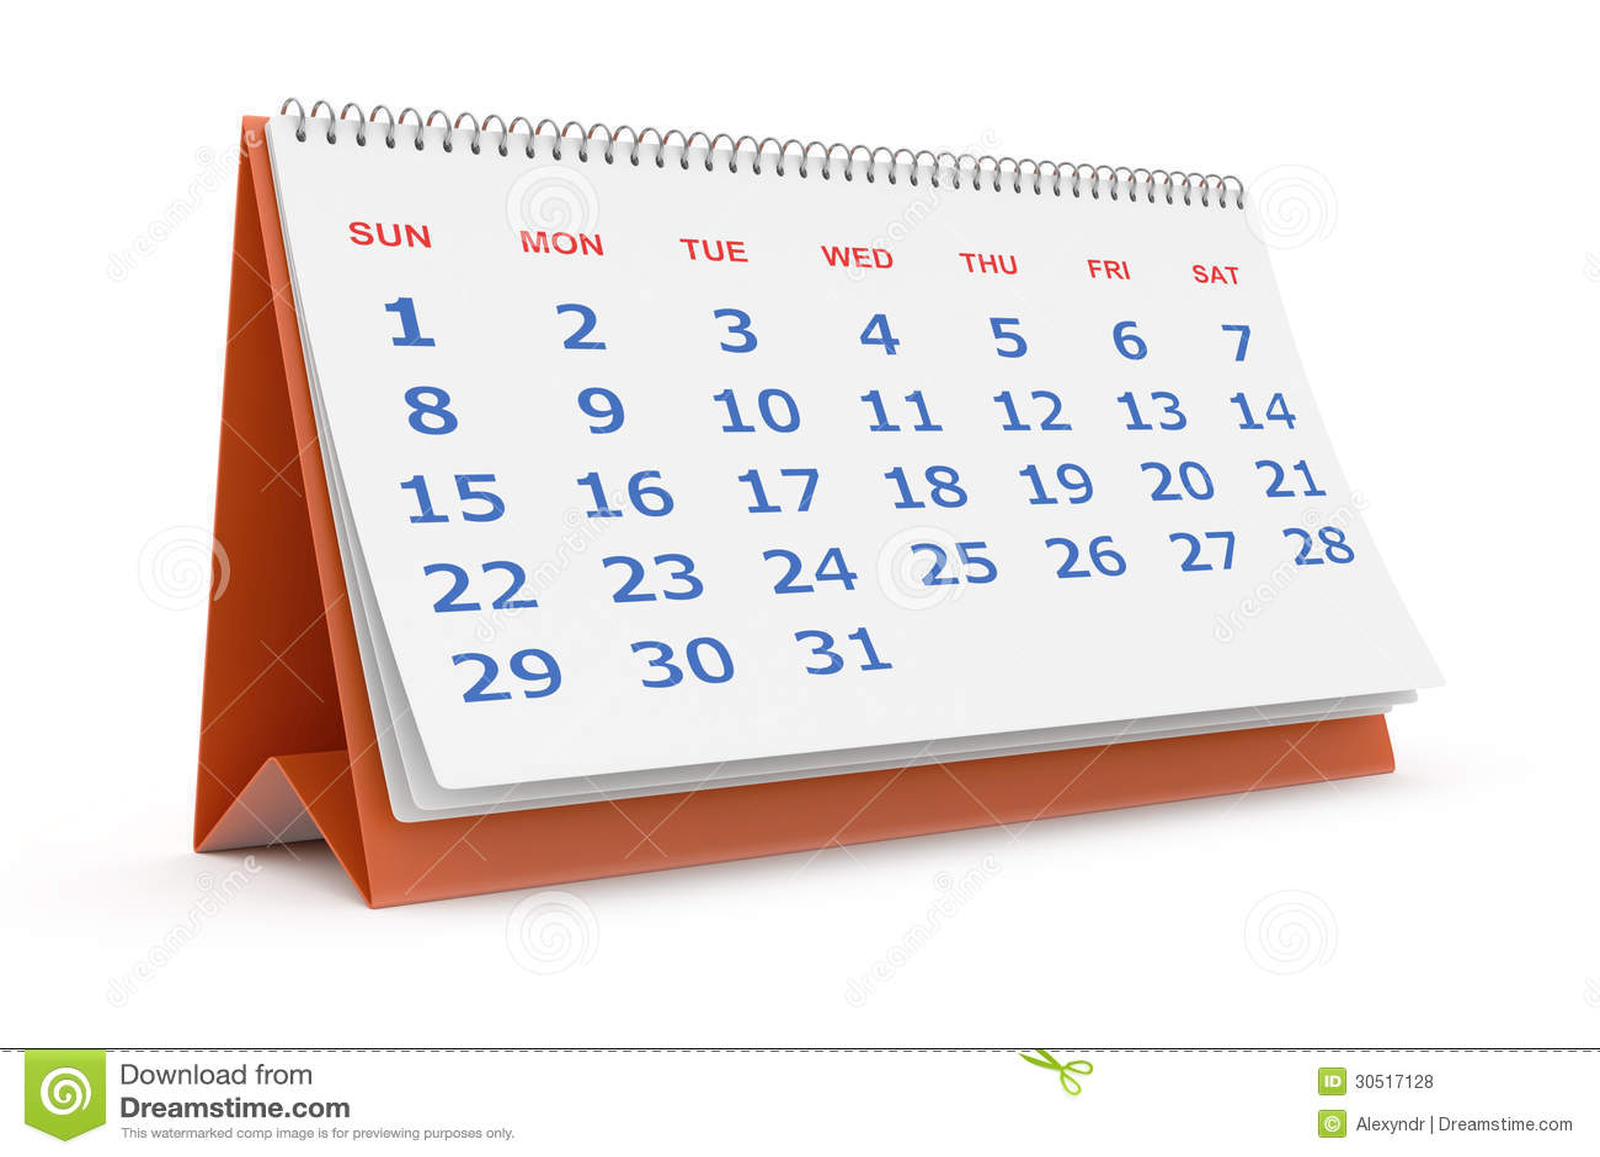 calendrier de bureau photos libres de droits image 30517128